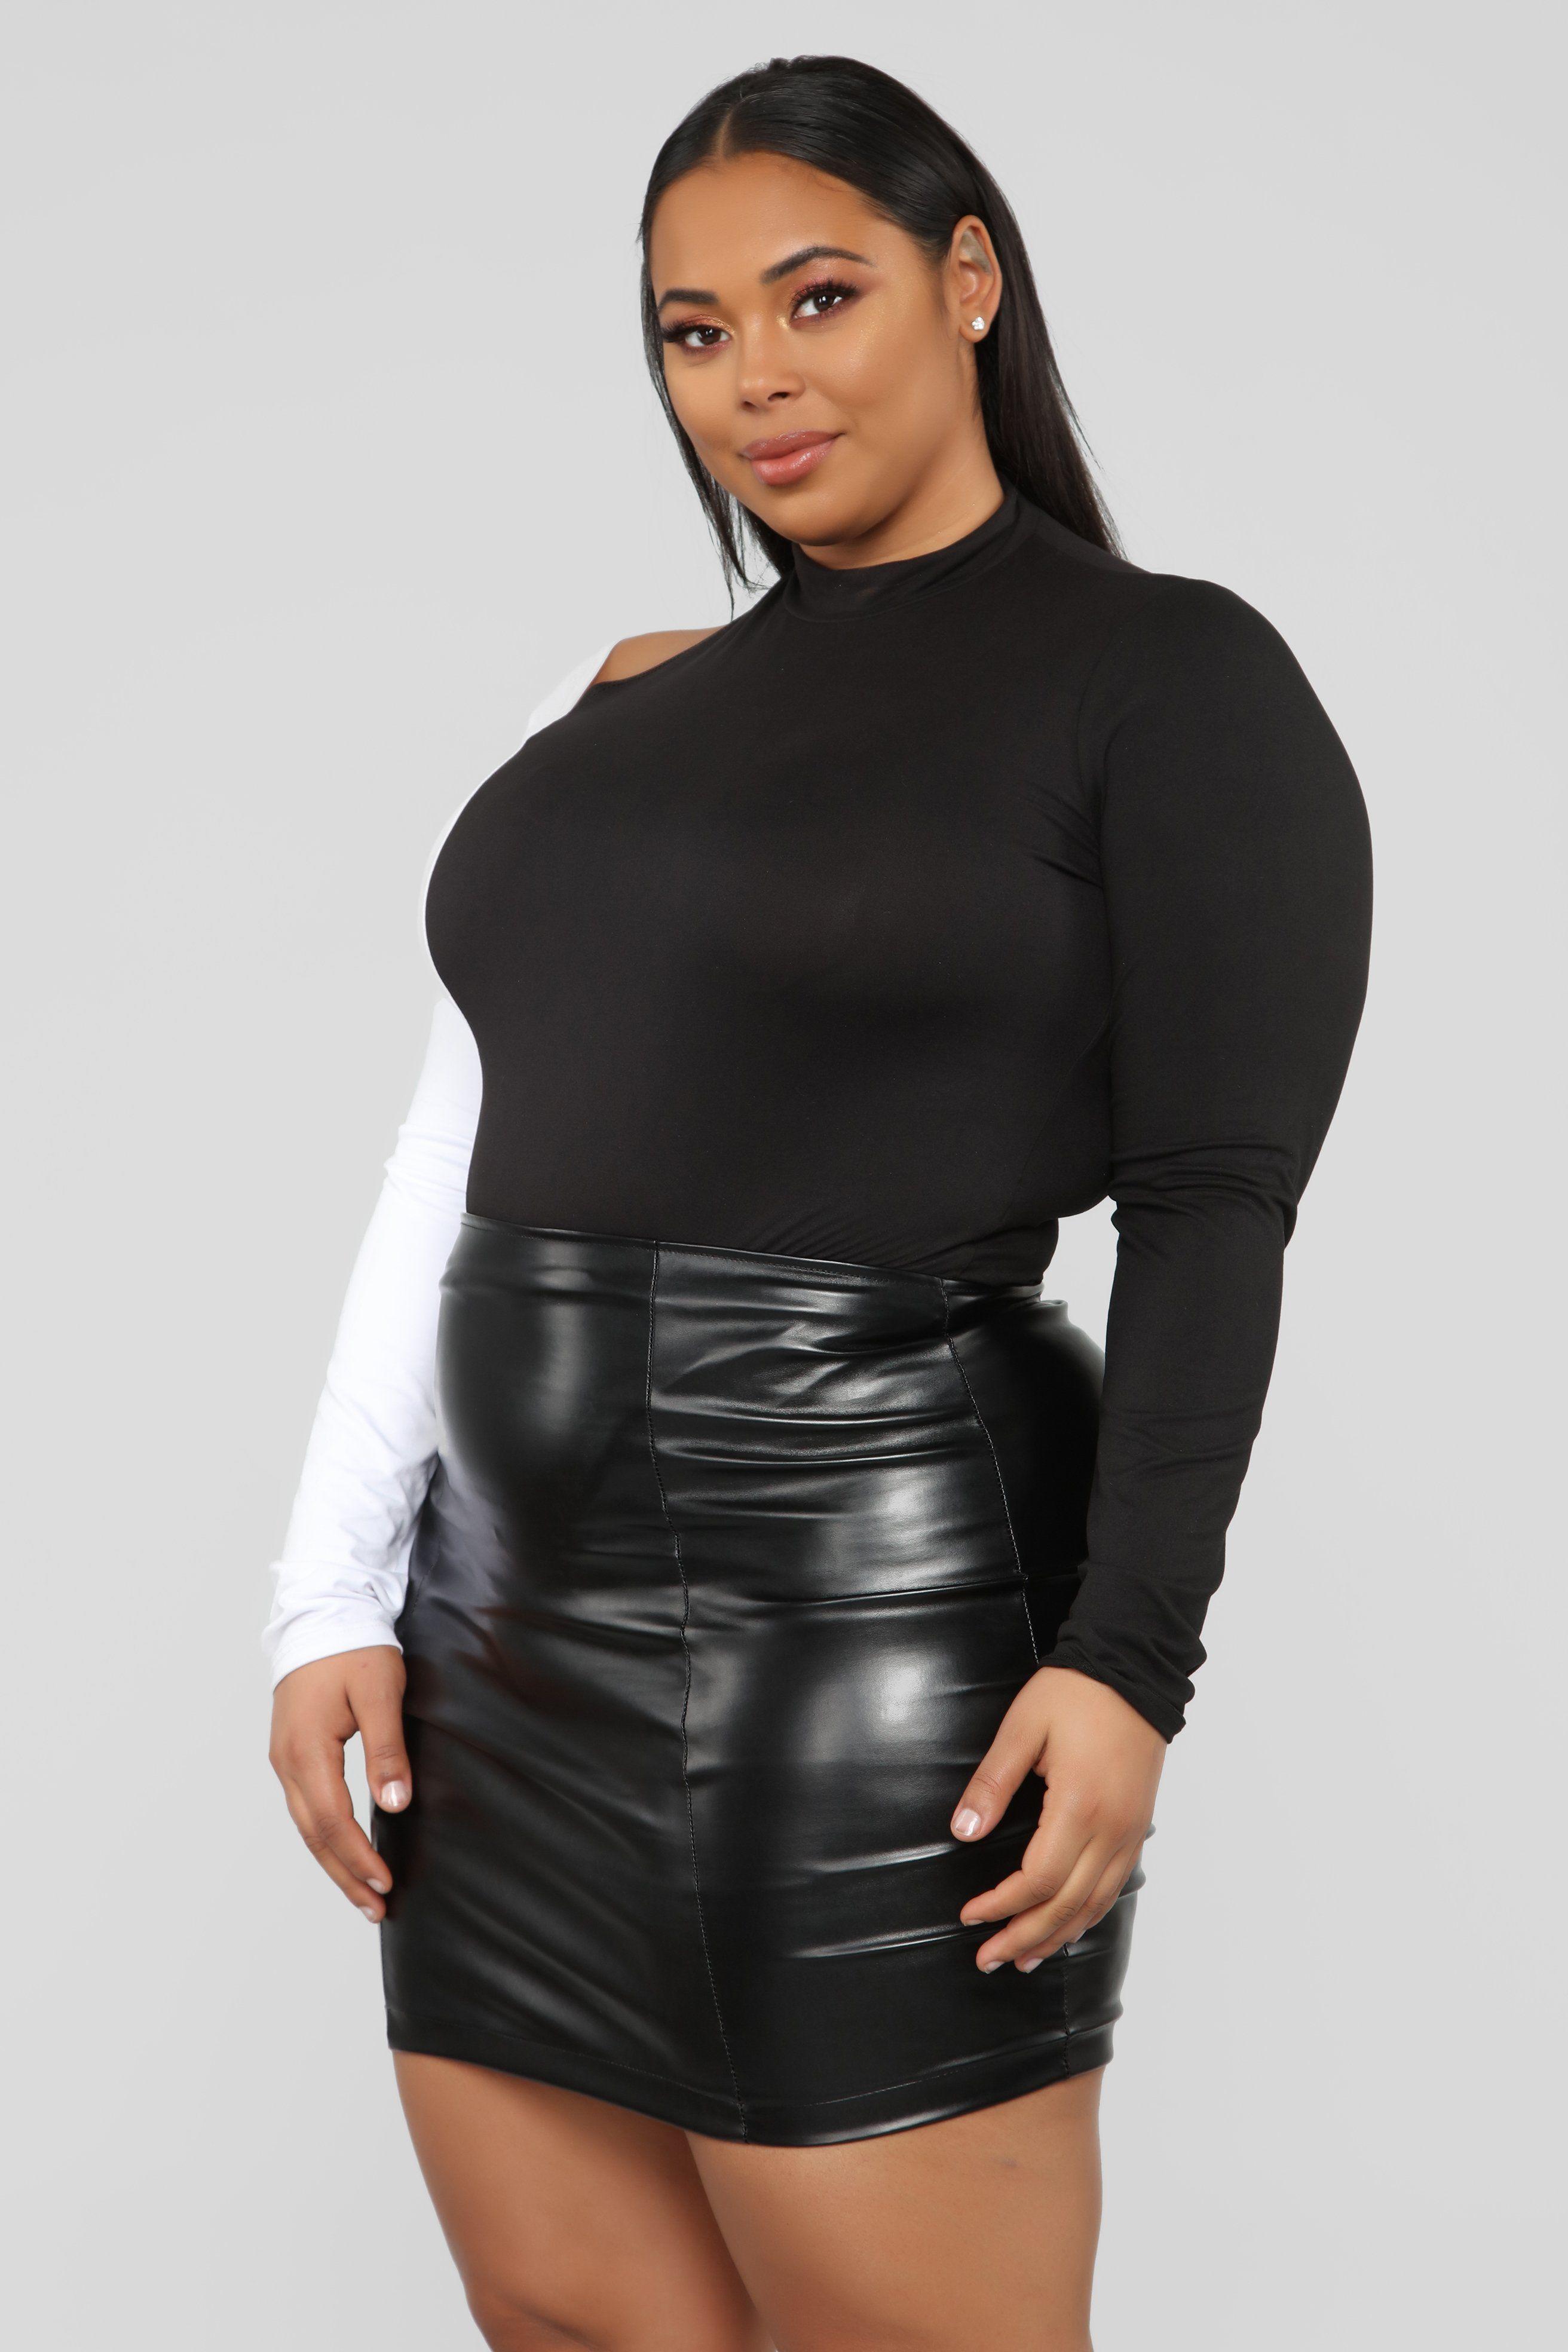 d2748fe8eba9e Tabria Majors Curvy Plus Size